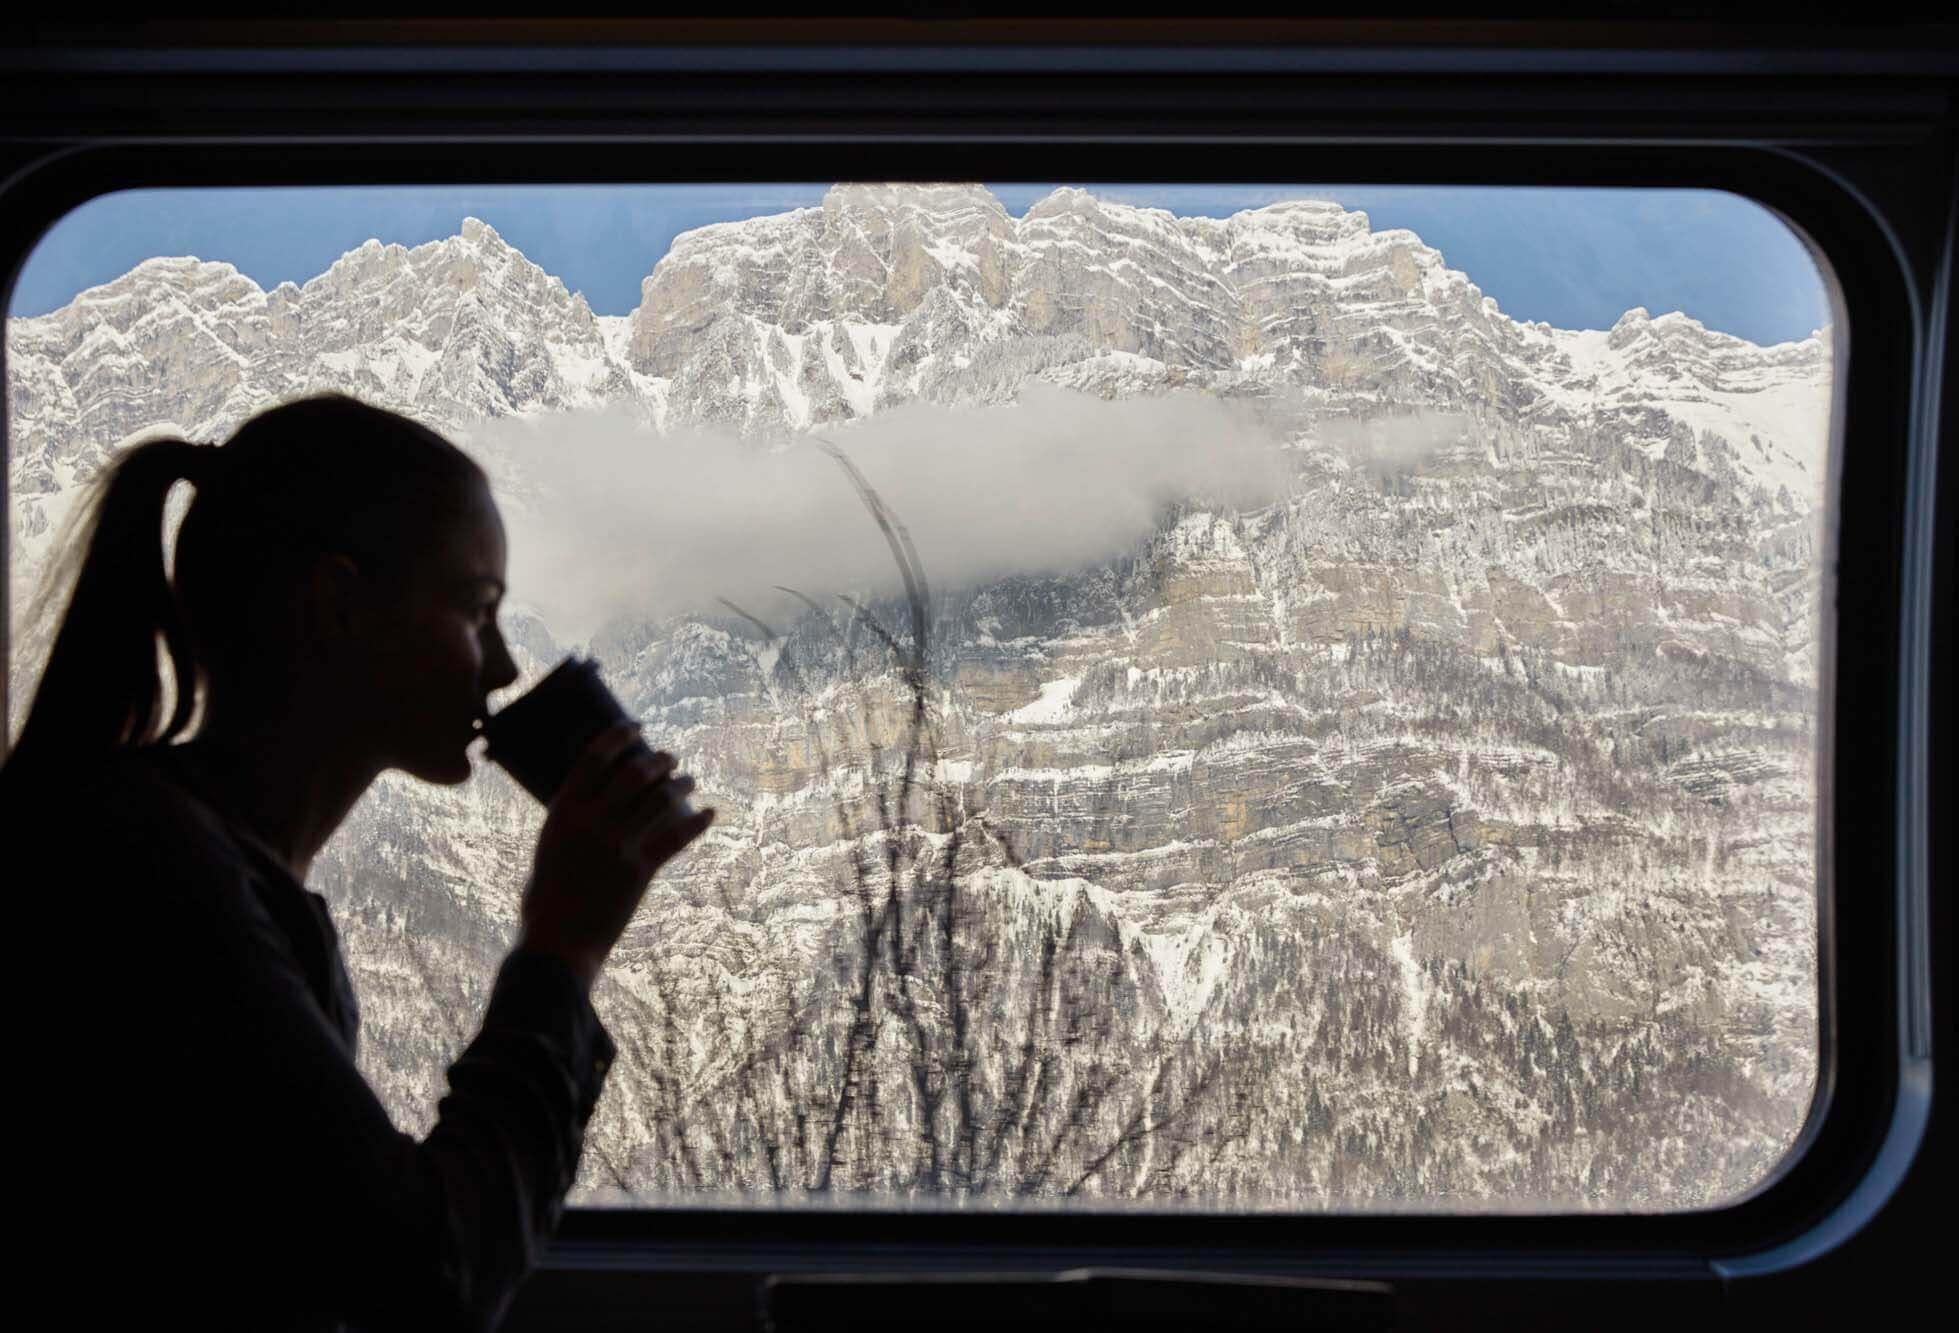 Kaffee, Zug, Reisen, Berg, Frau